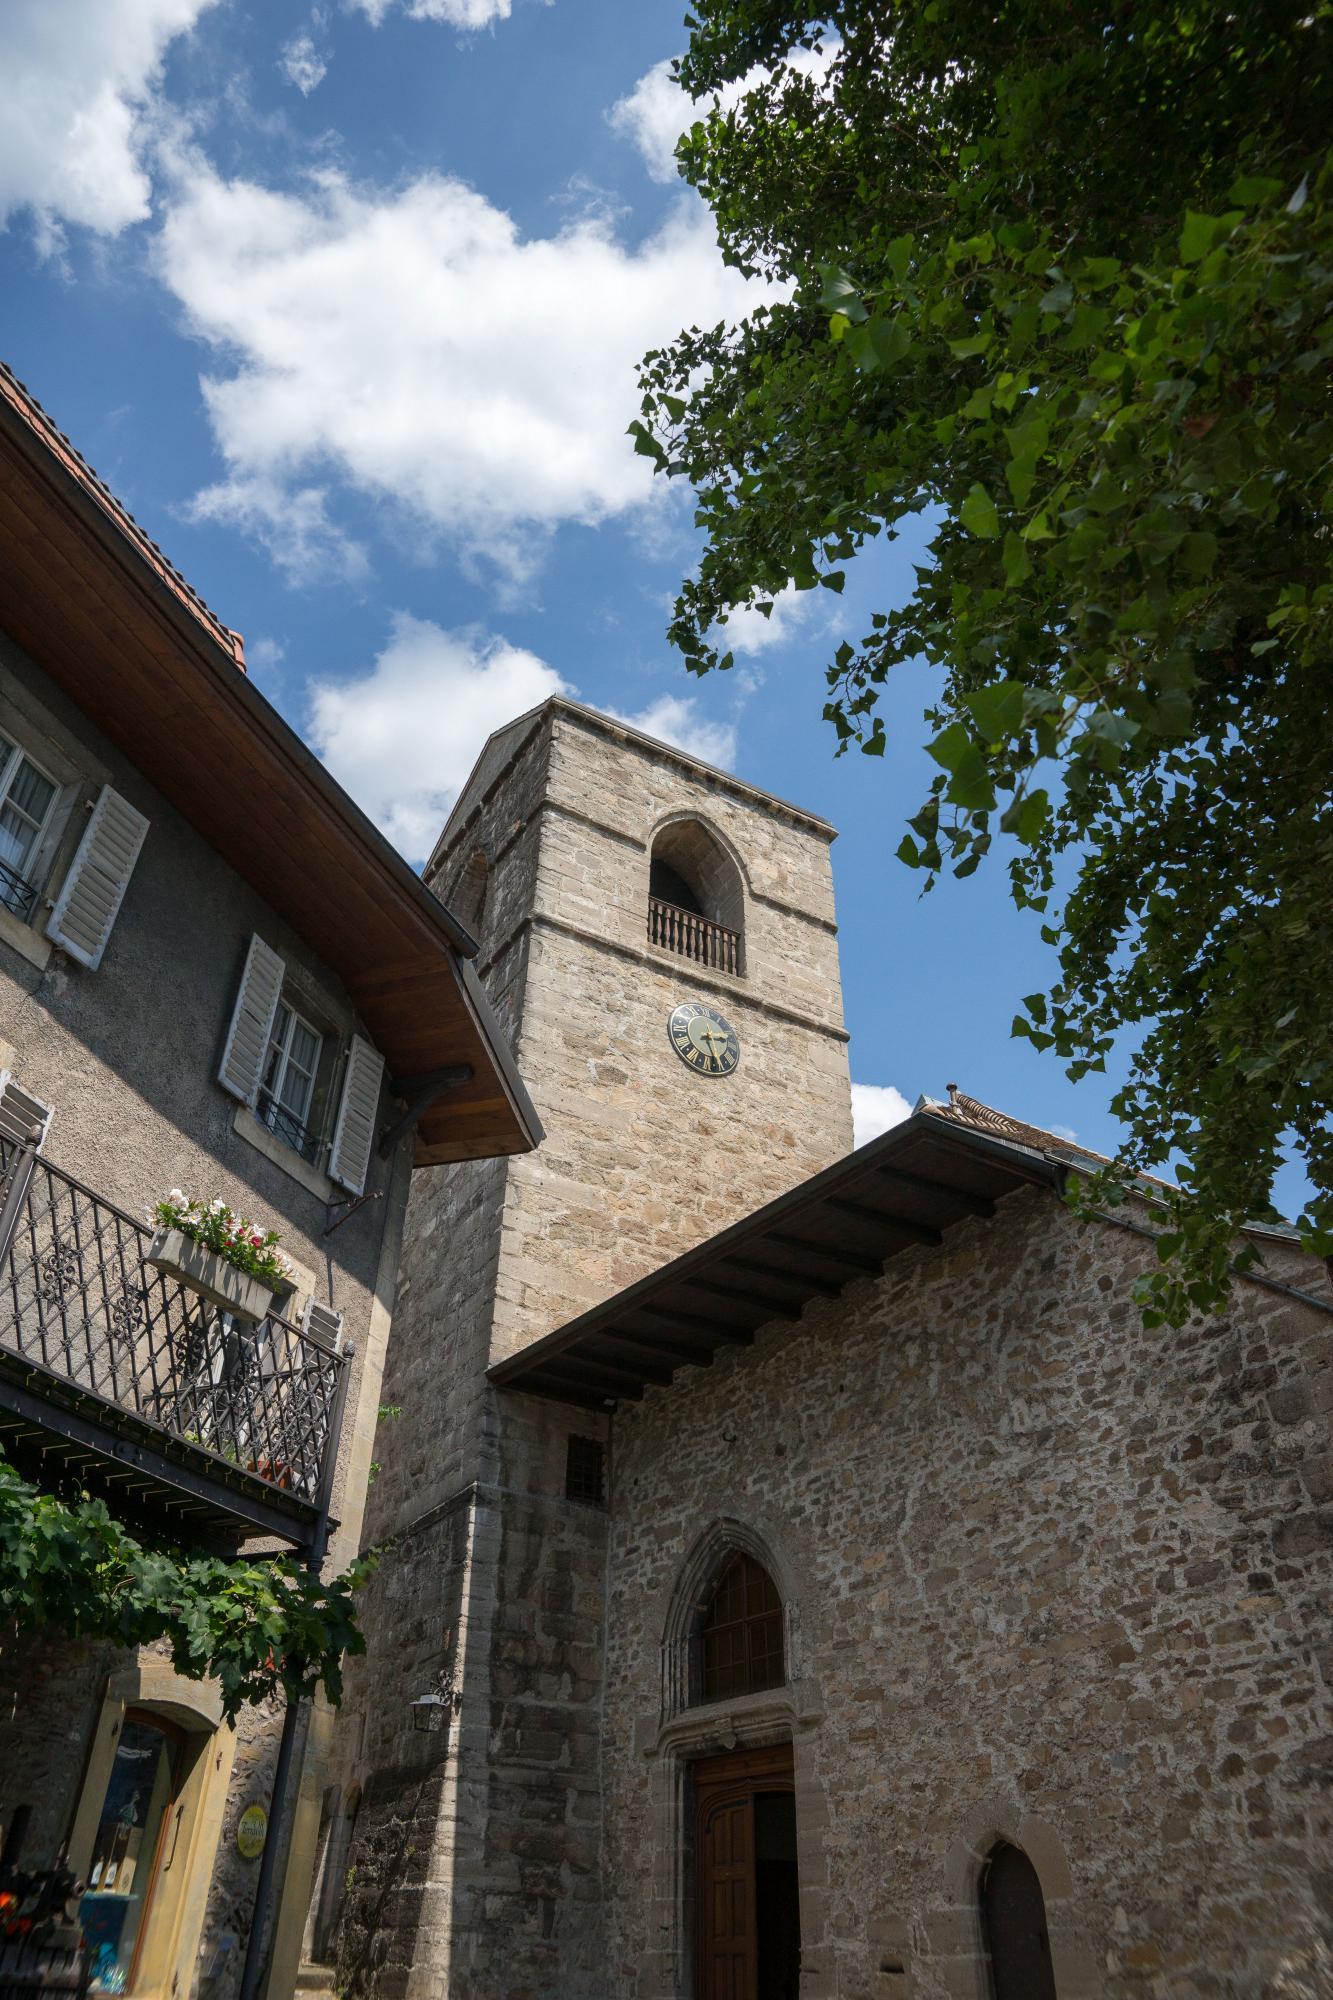 Collge Sainte-Croix - Kollegium Heilig Kreuz Online Katalog: